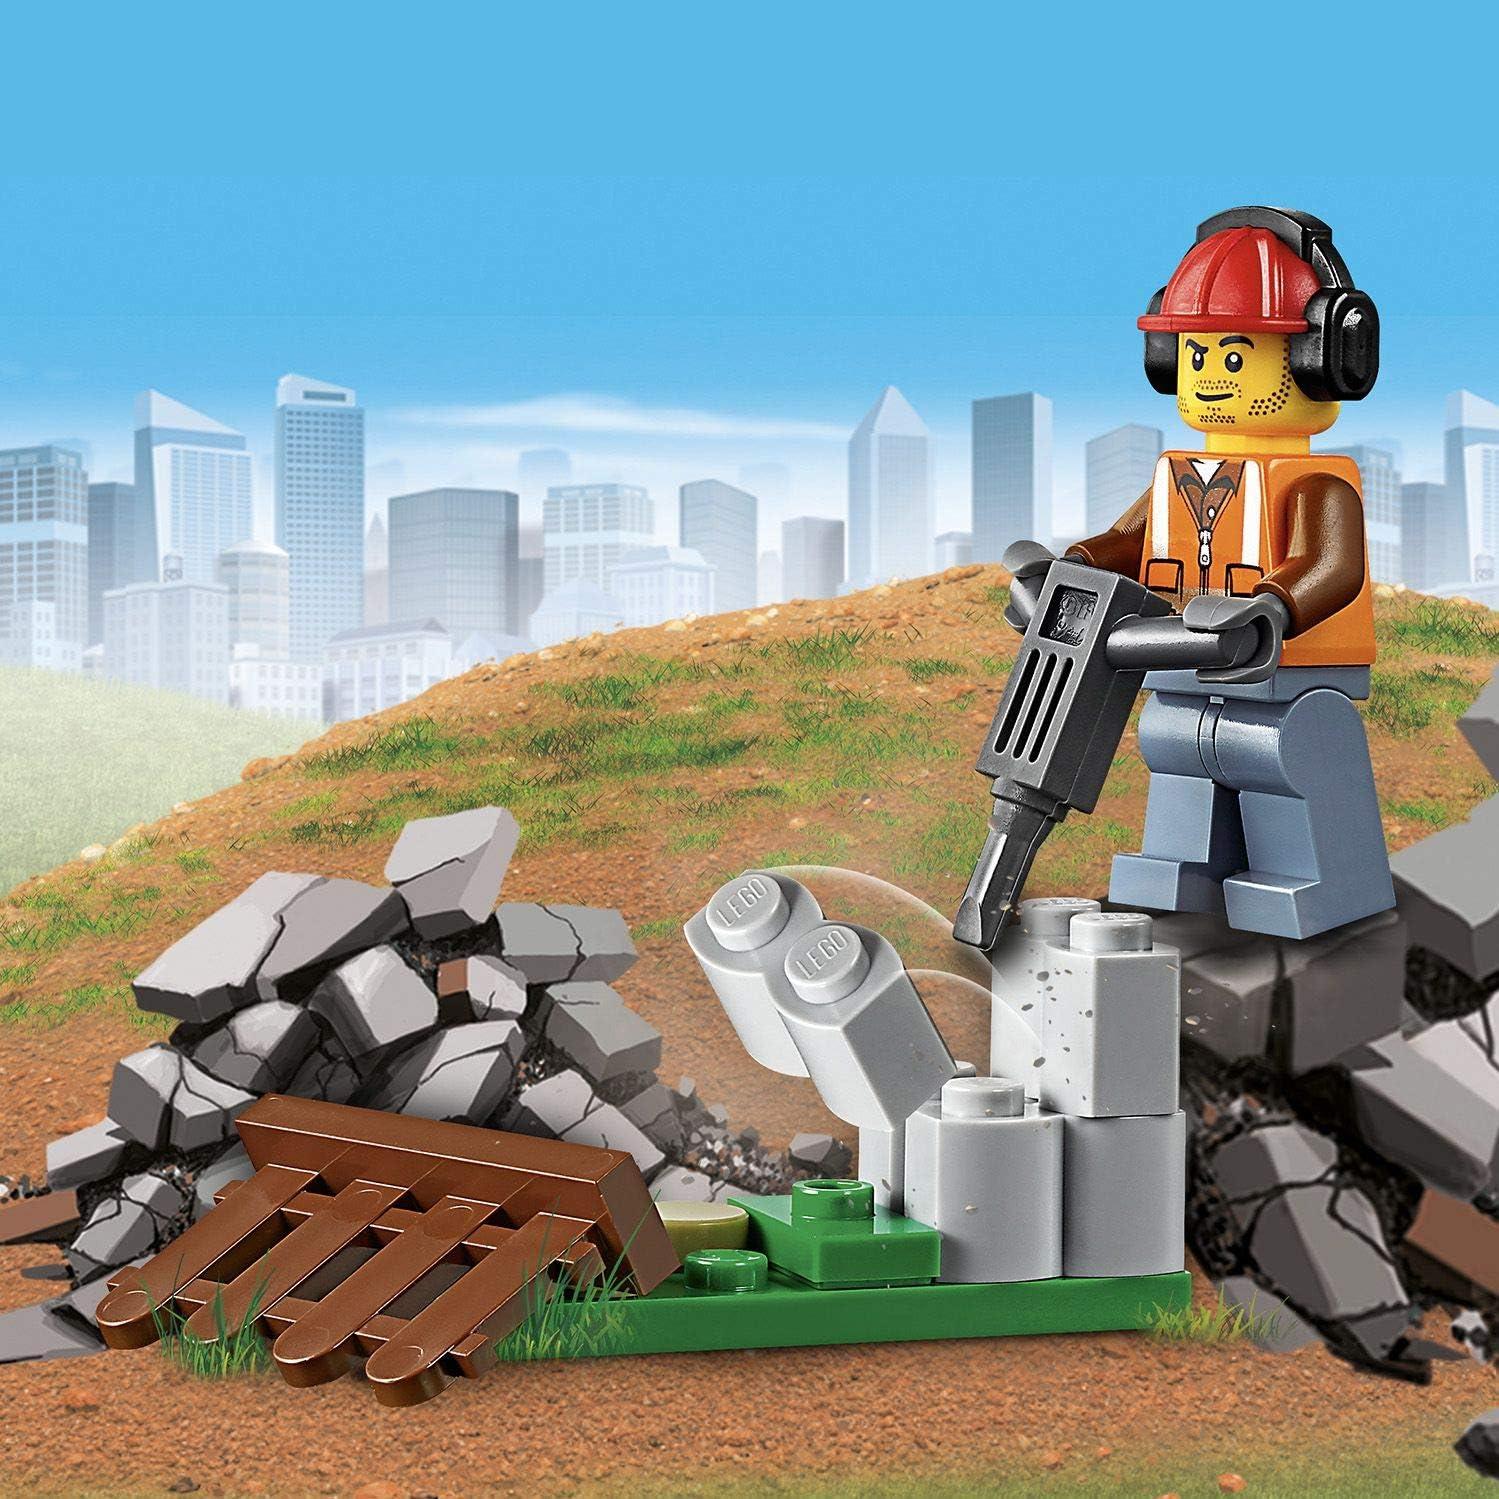 LEGO CITY operaio edile retrattile penna